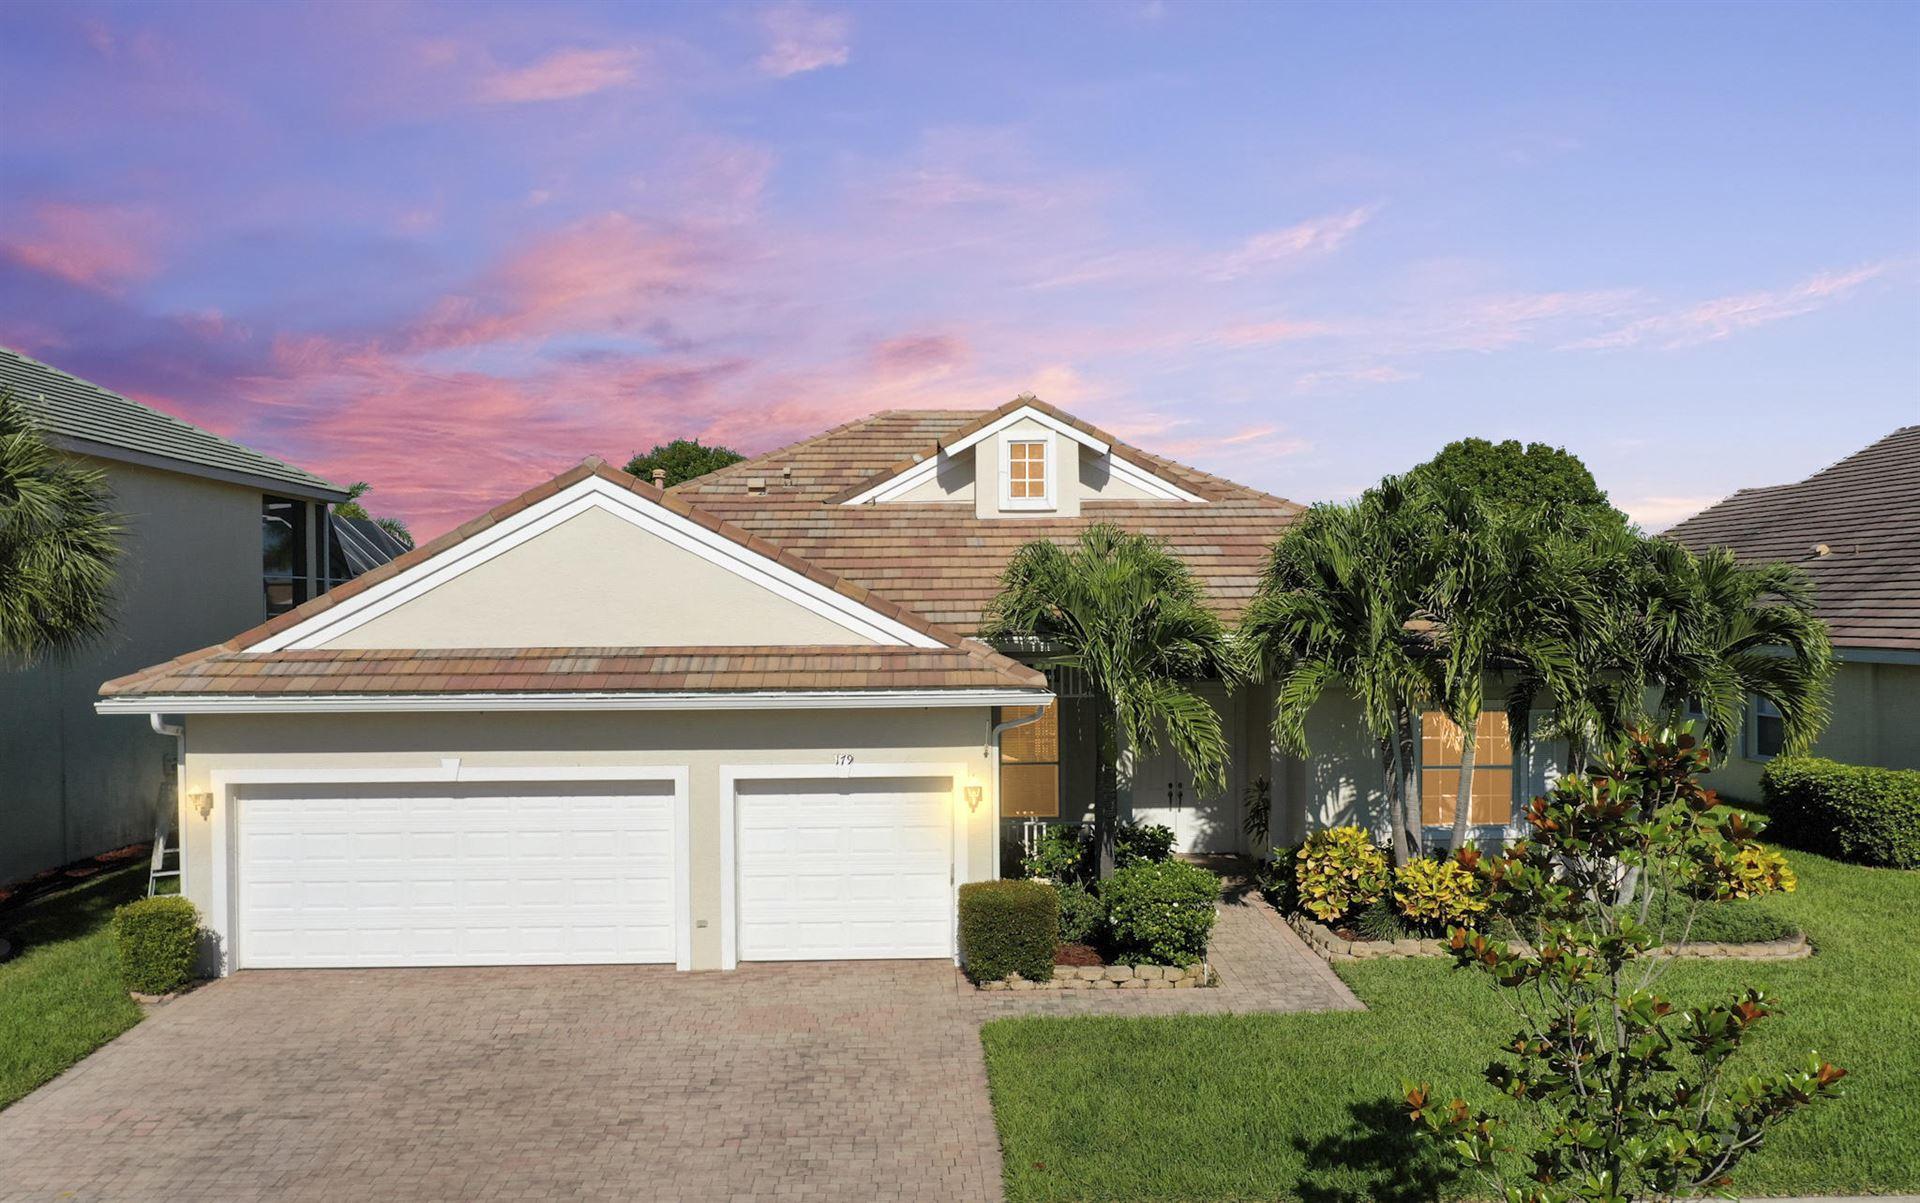 179 NW Magnolia Lakes Boulevard, Port Saint Lucie, FL 34986 - #: RX-10620337